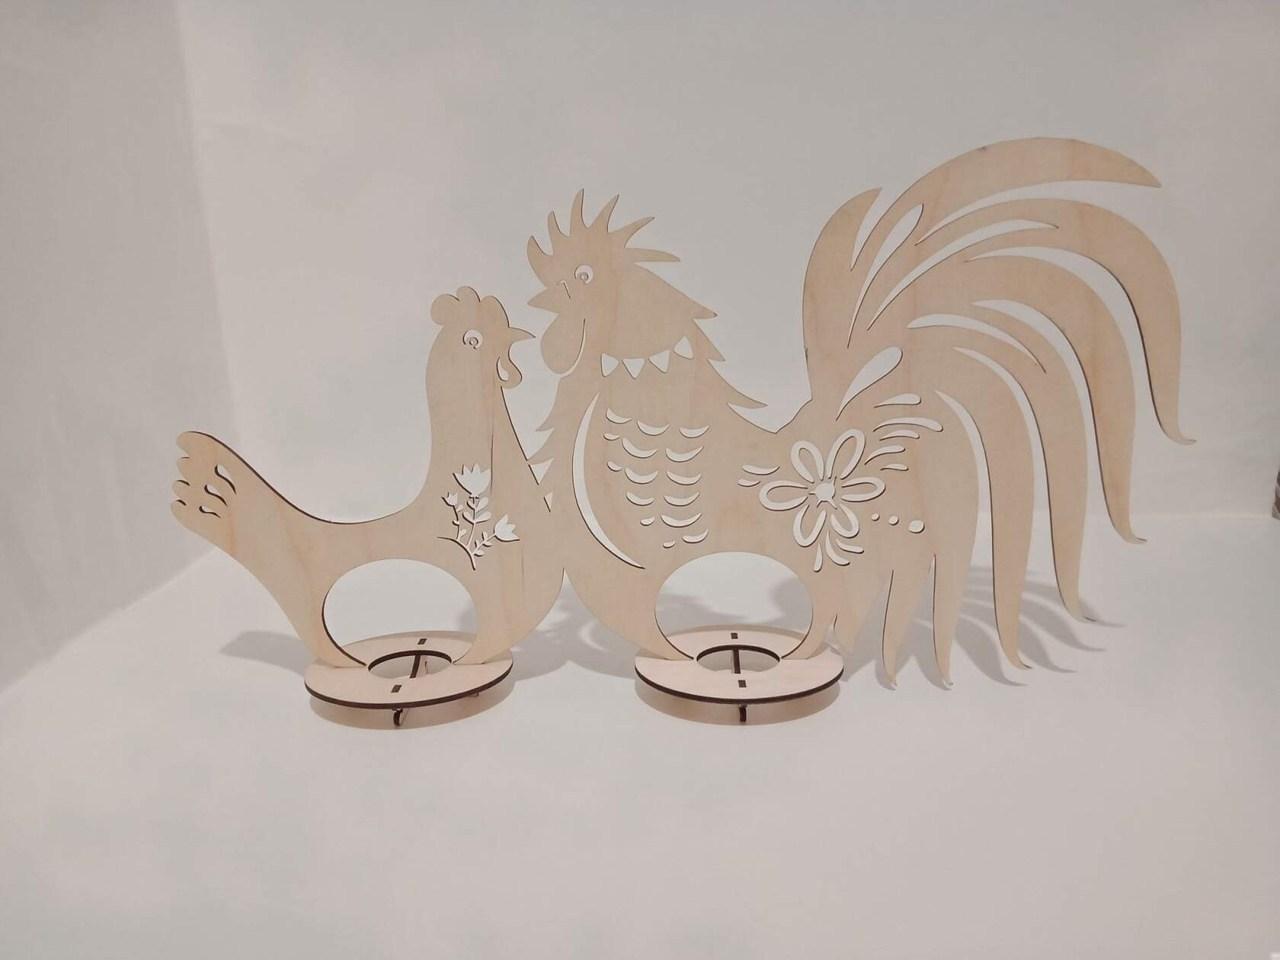 Wooden Hen Rooster Easter Egg Holder Laser Cutting Template Free CDR Vectors Art